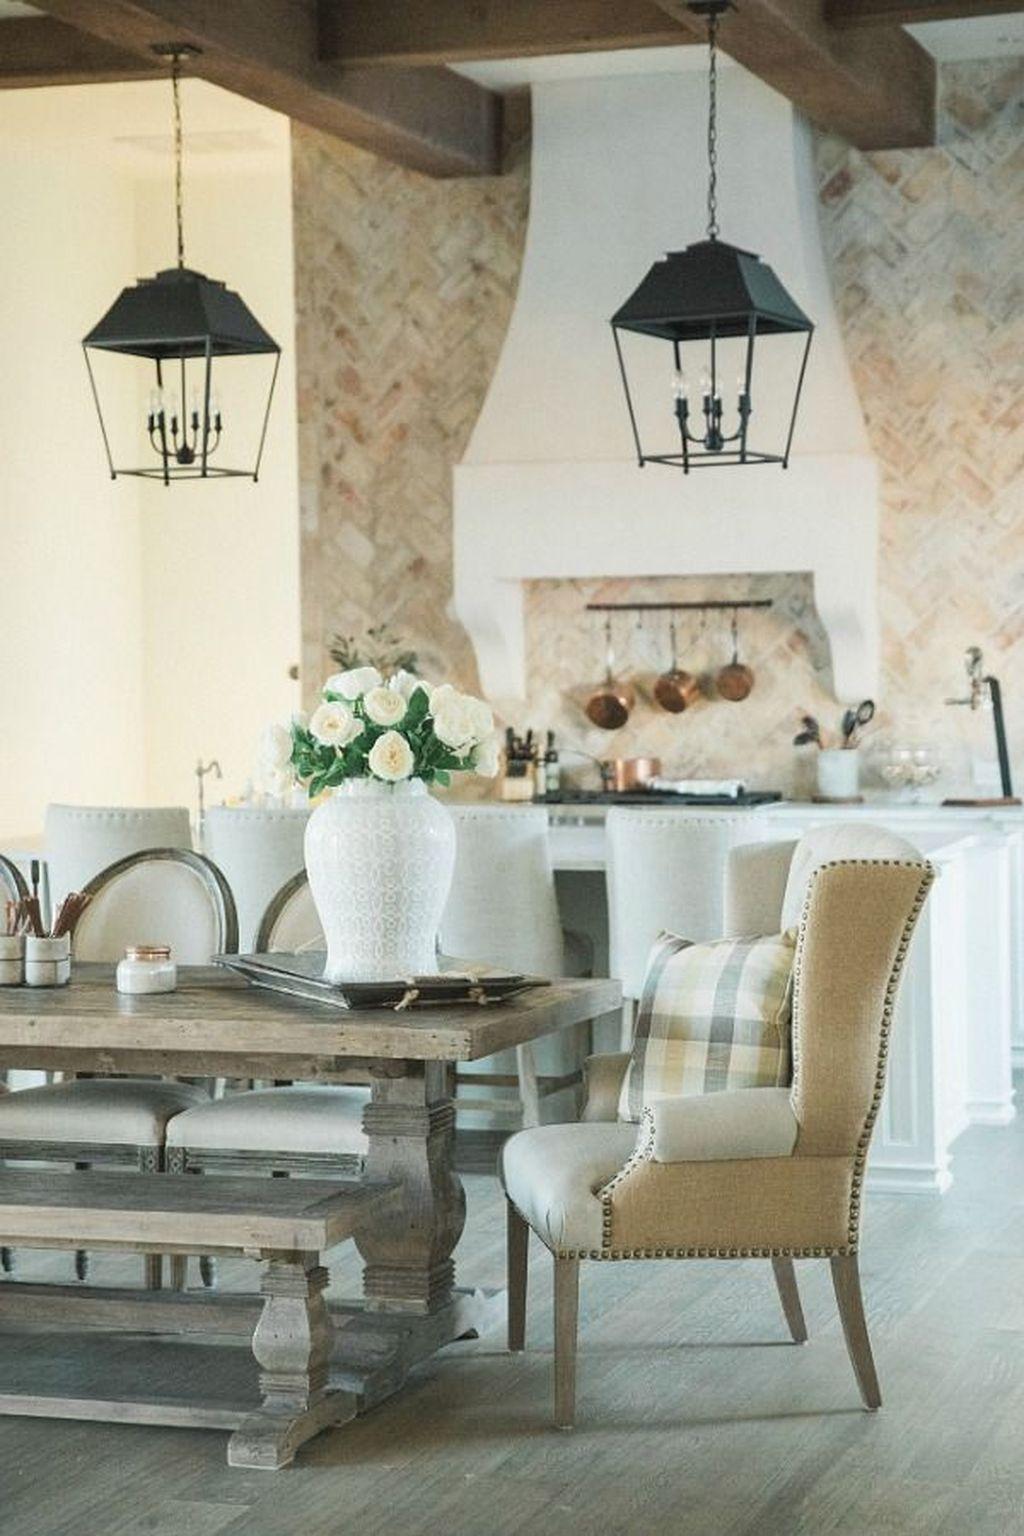 Stunning Farmhouse Interior Design Ideas To Realize Your Dreams 15